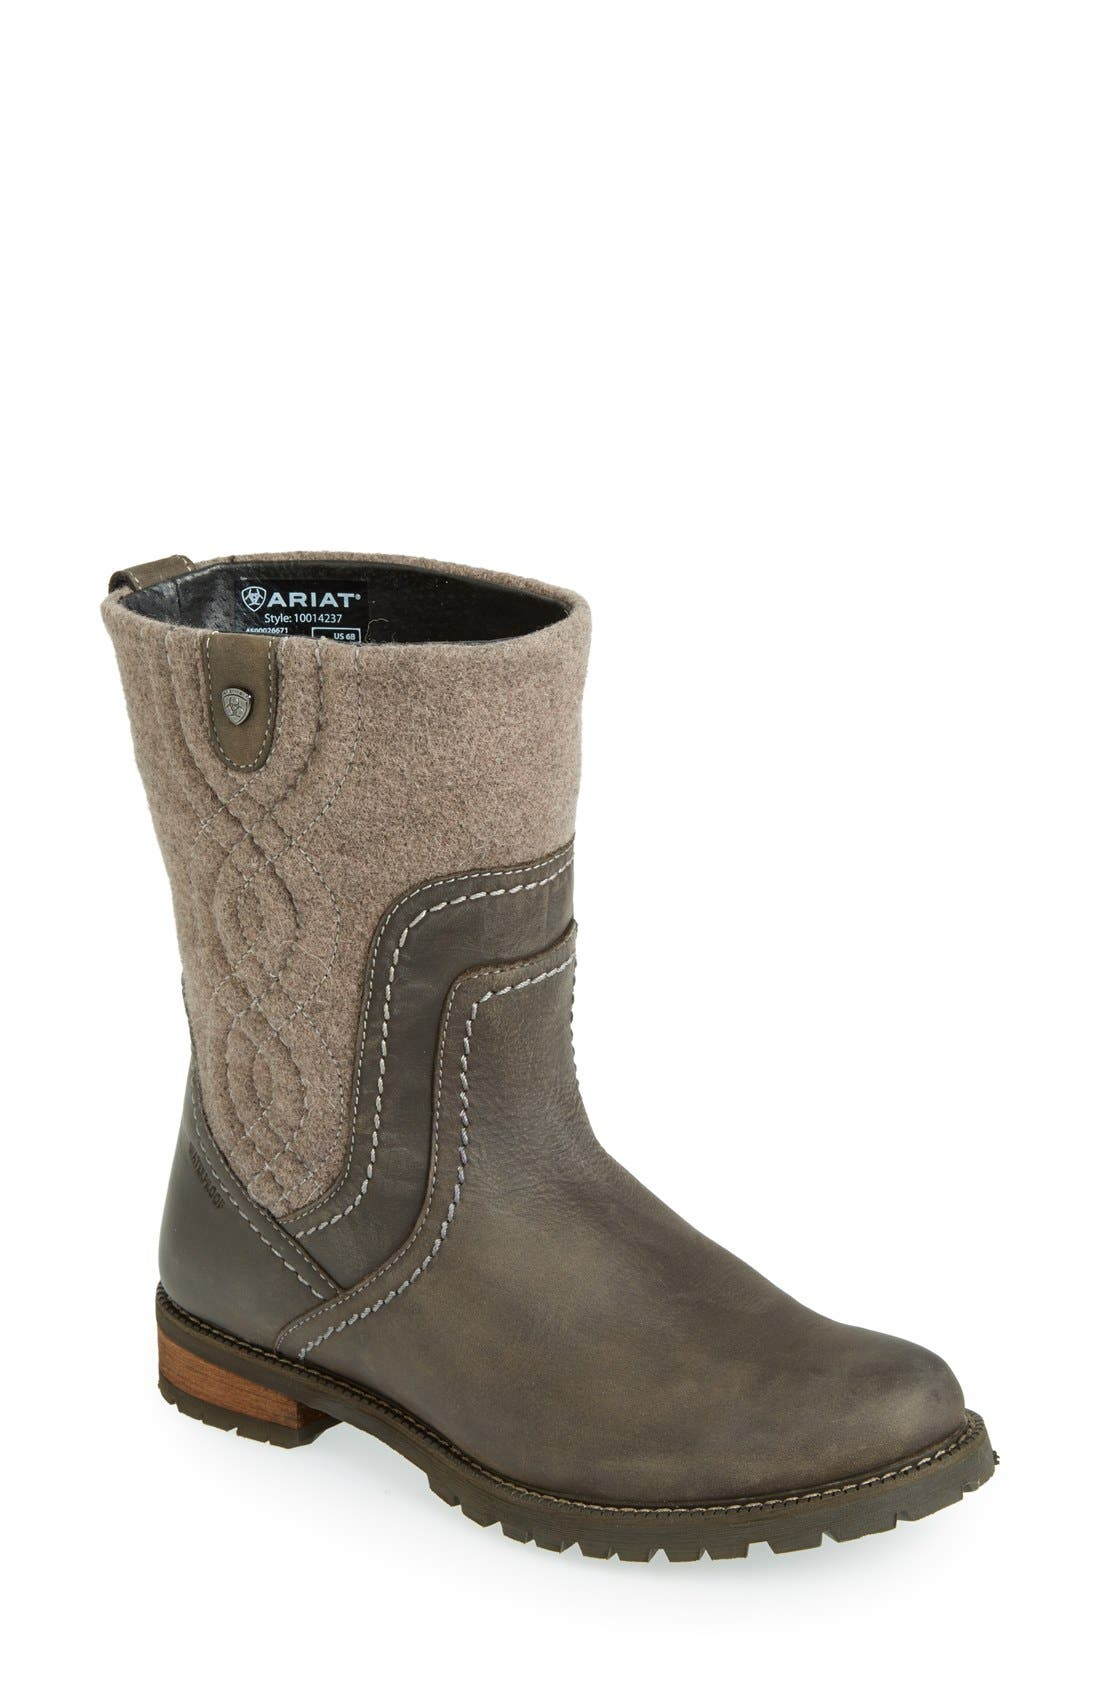 Alternate Image 1 Selected - Ariat 'Shannon H20' Waterproof Boot (Women)